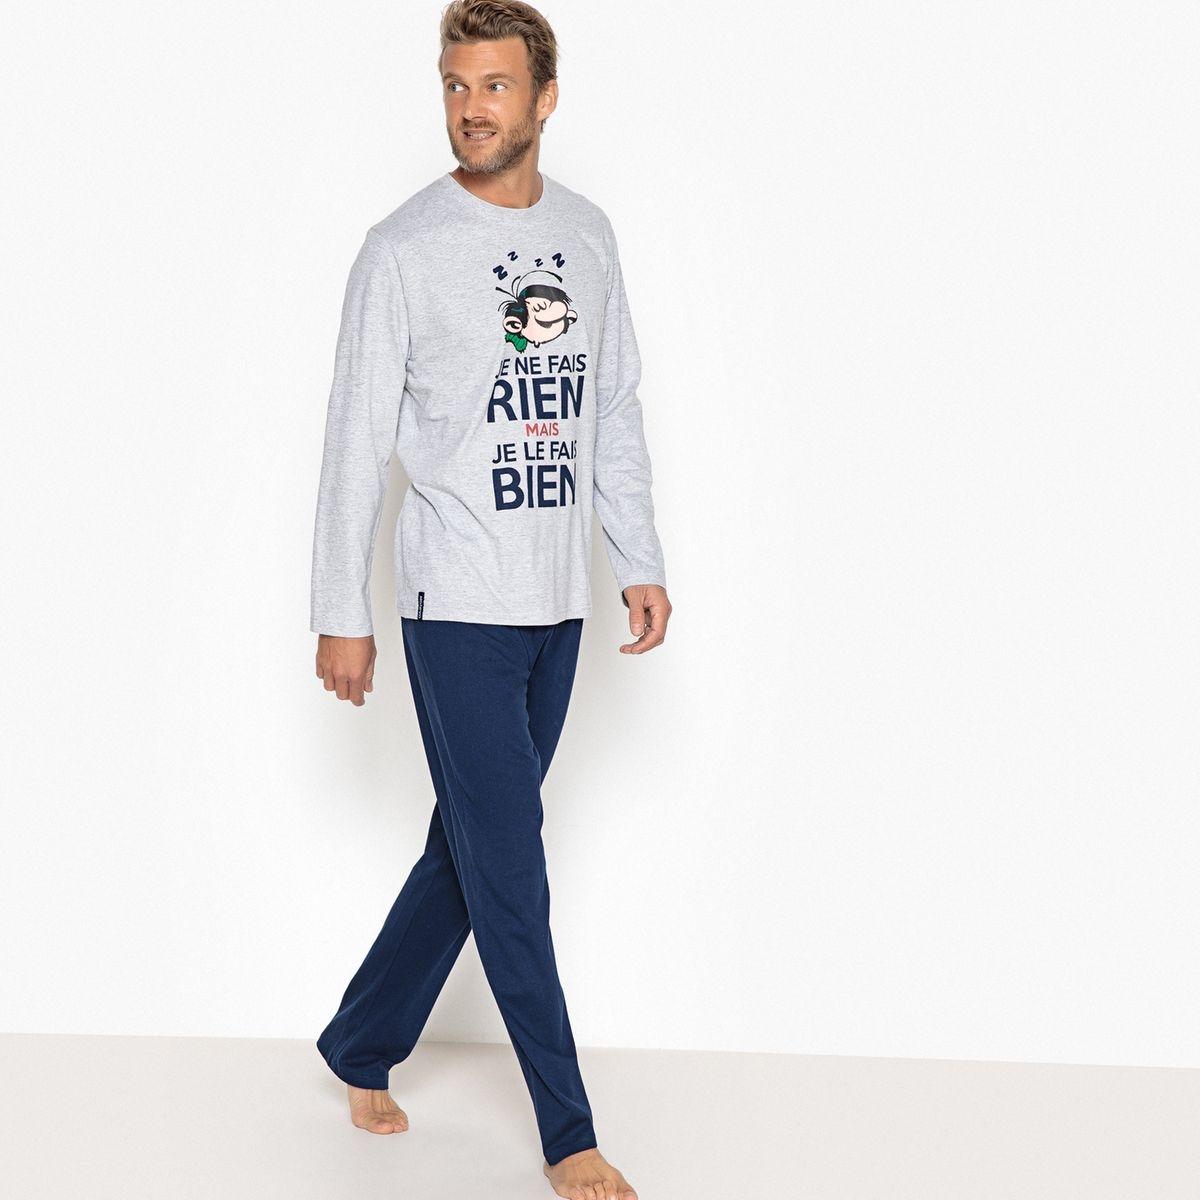 Pyjama 2 pièces, manches longues Gaston Lagaffe